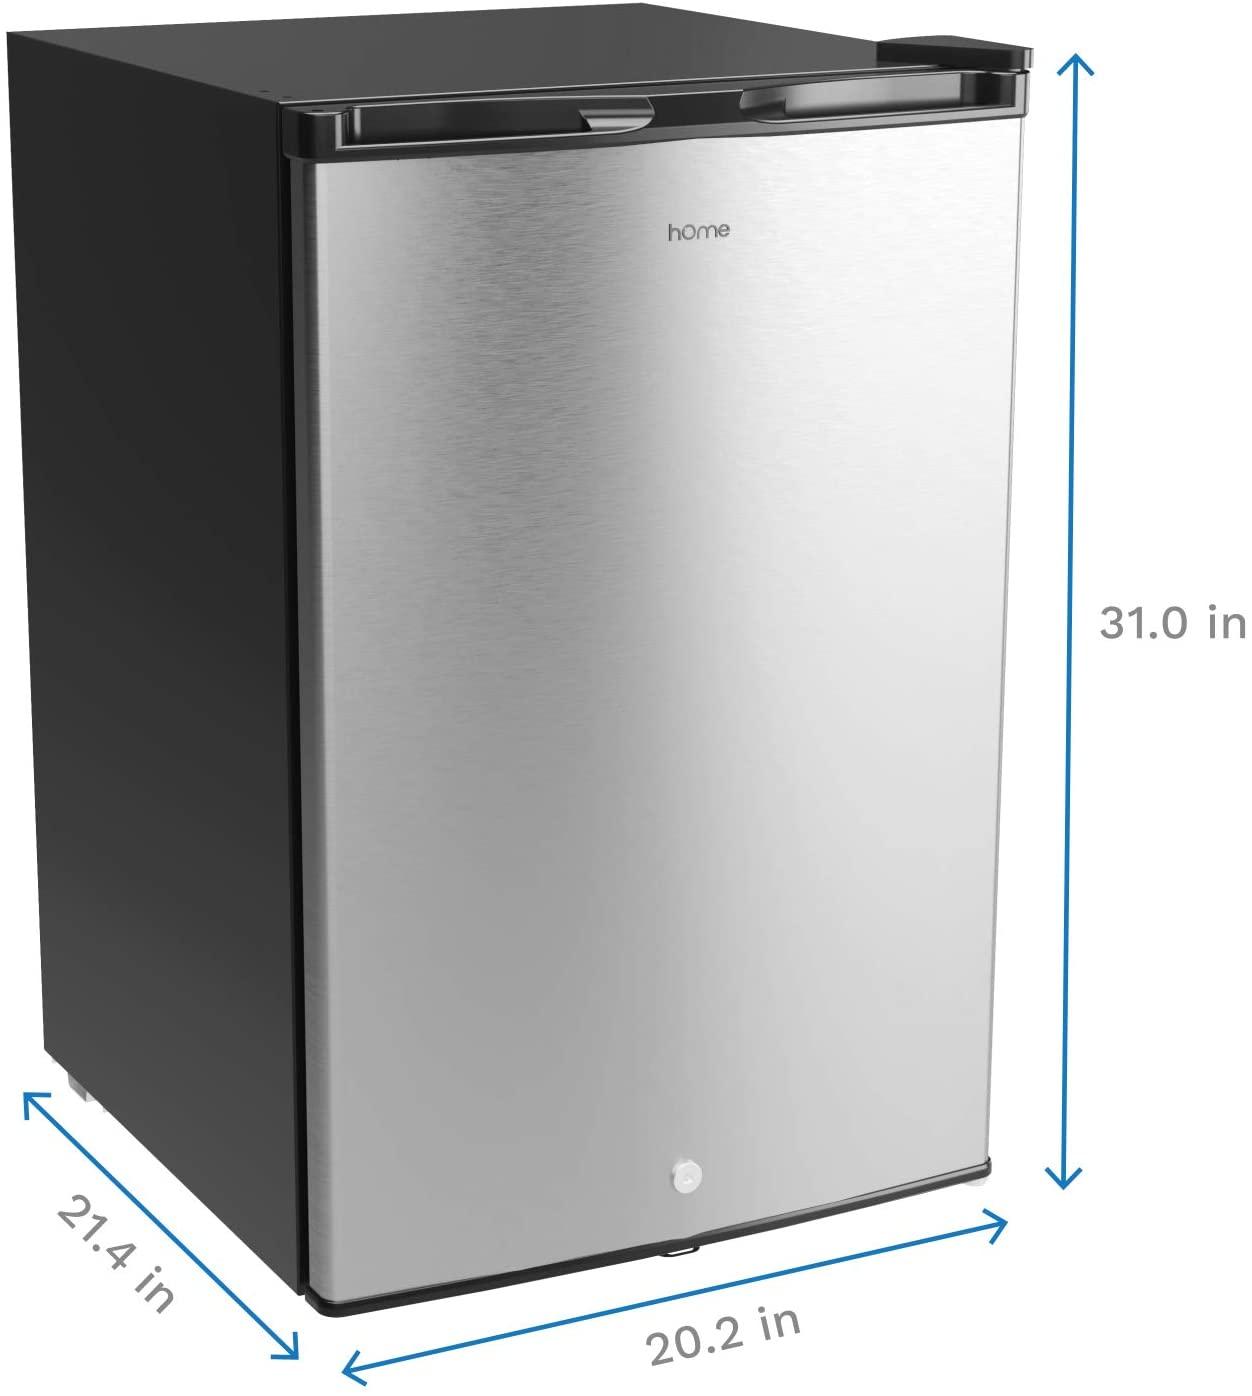 hOmelabs Upright Freezer 3.0 Cu. Ft. Specs